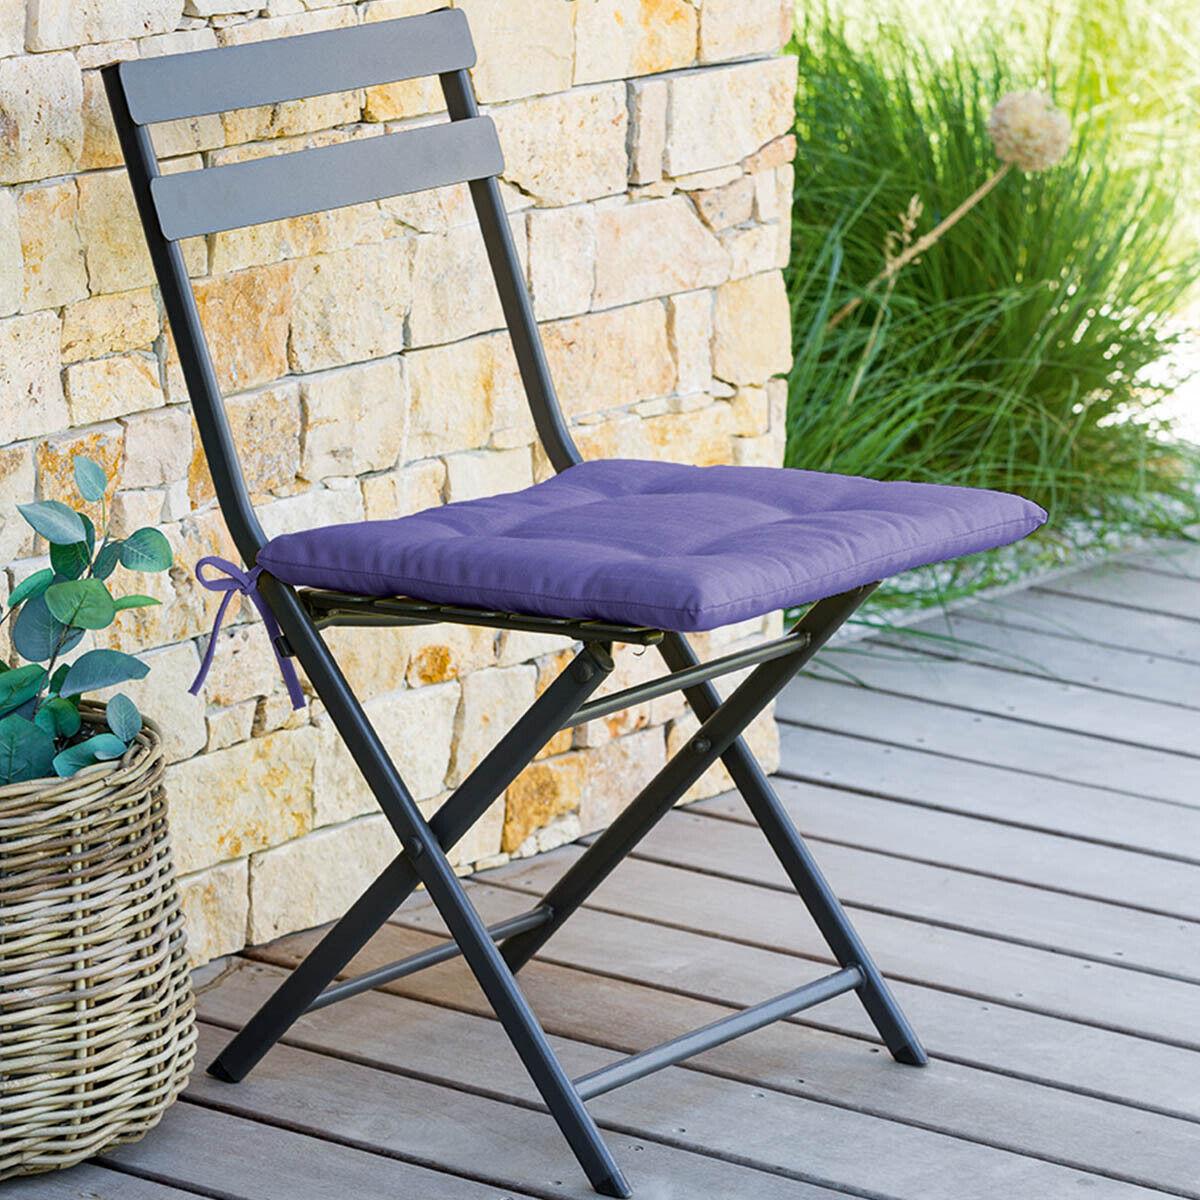 Hespéride Galette de chaise 4 points Korai Lavande Jardin